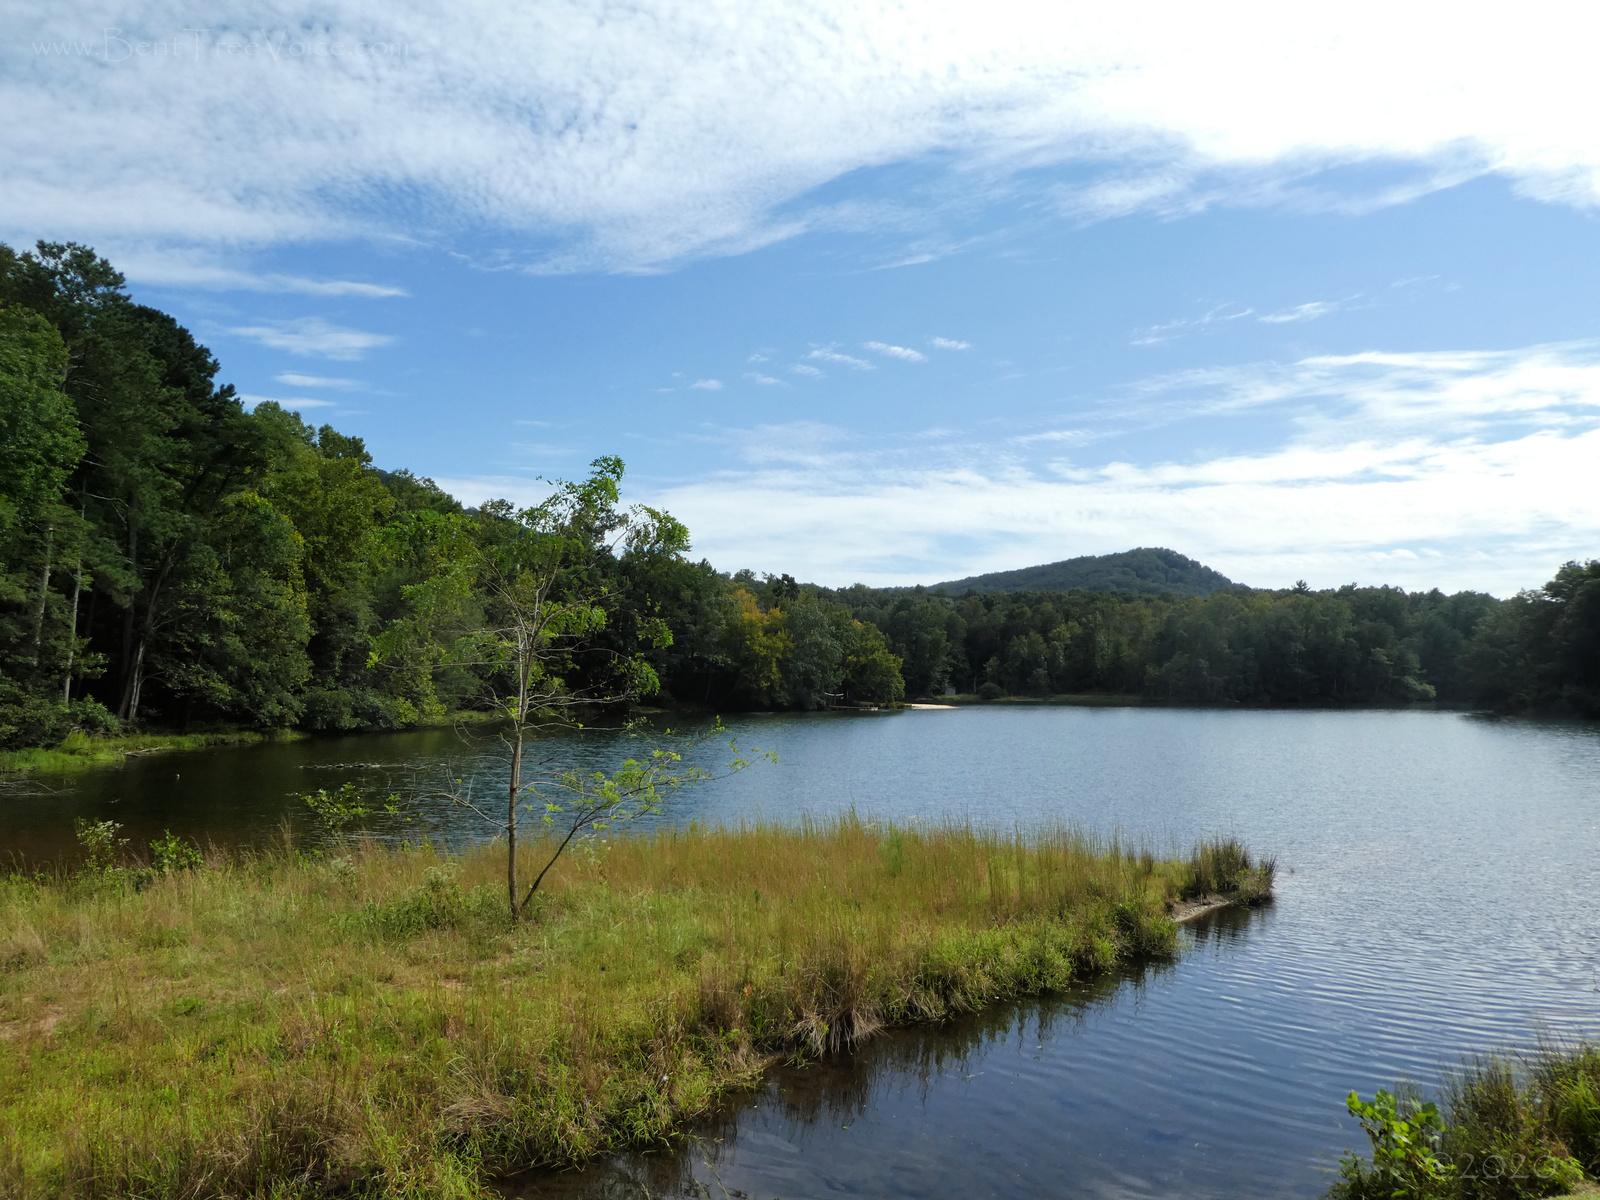 September 22, 2020 - Lake Tamarack in Bent Tree